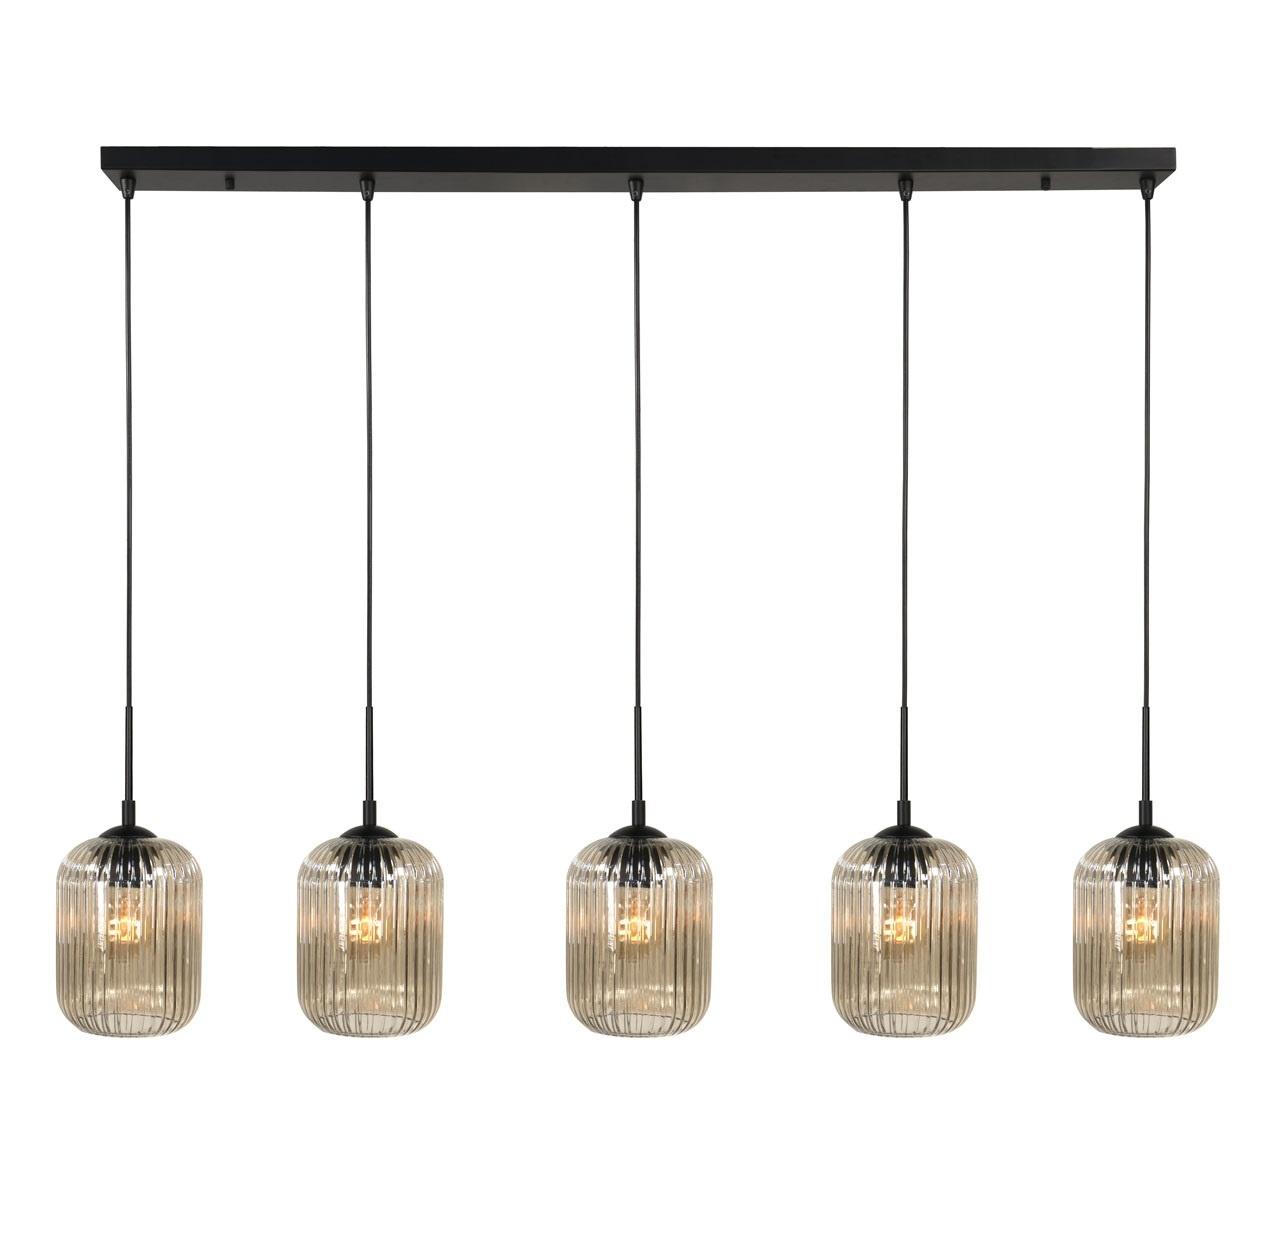 Hanglamp Castel Amber 5 Lichts 120cm |  | 8718379036811